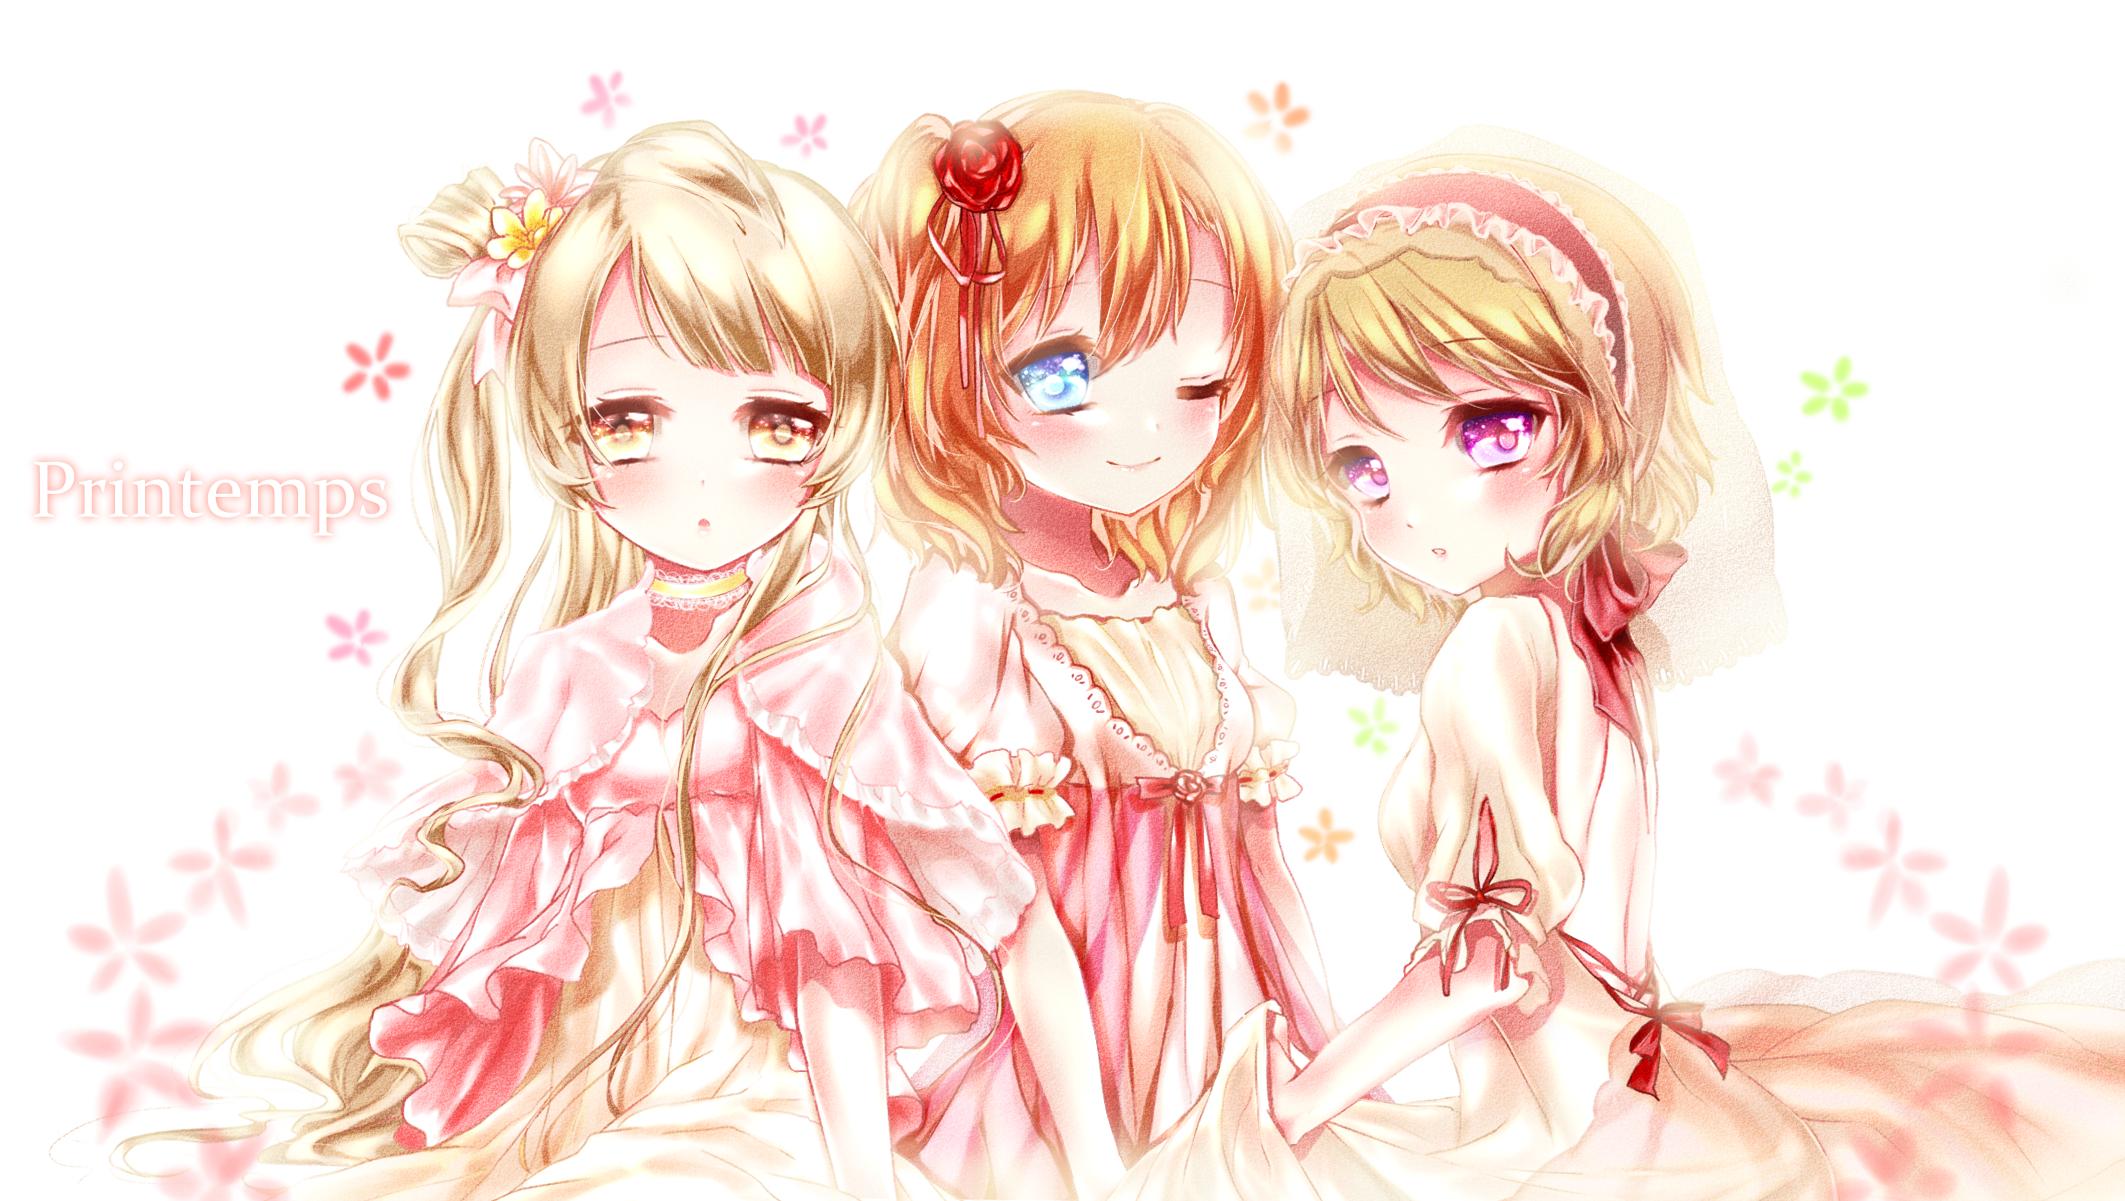 Love live character kotori minami 8